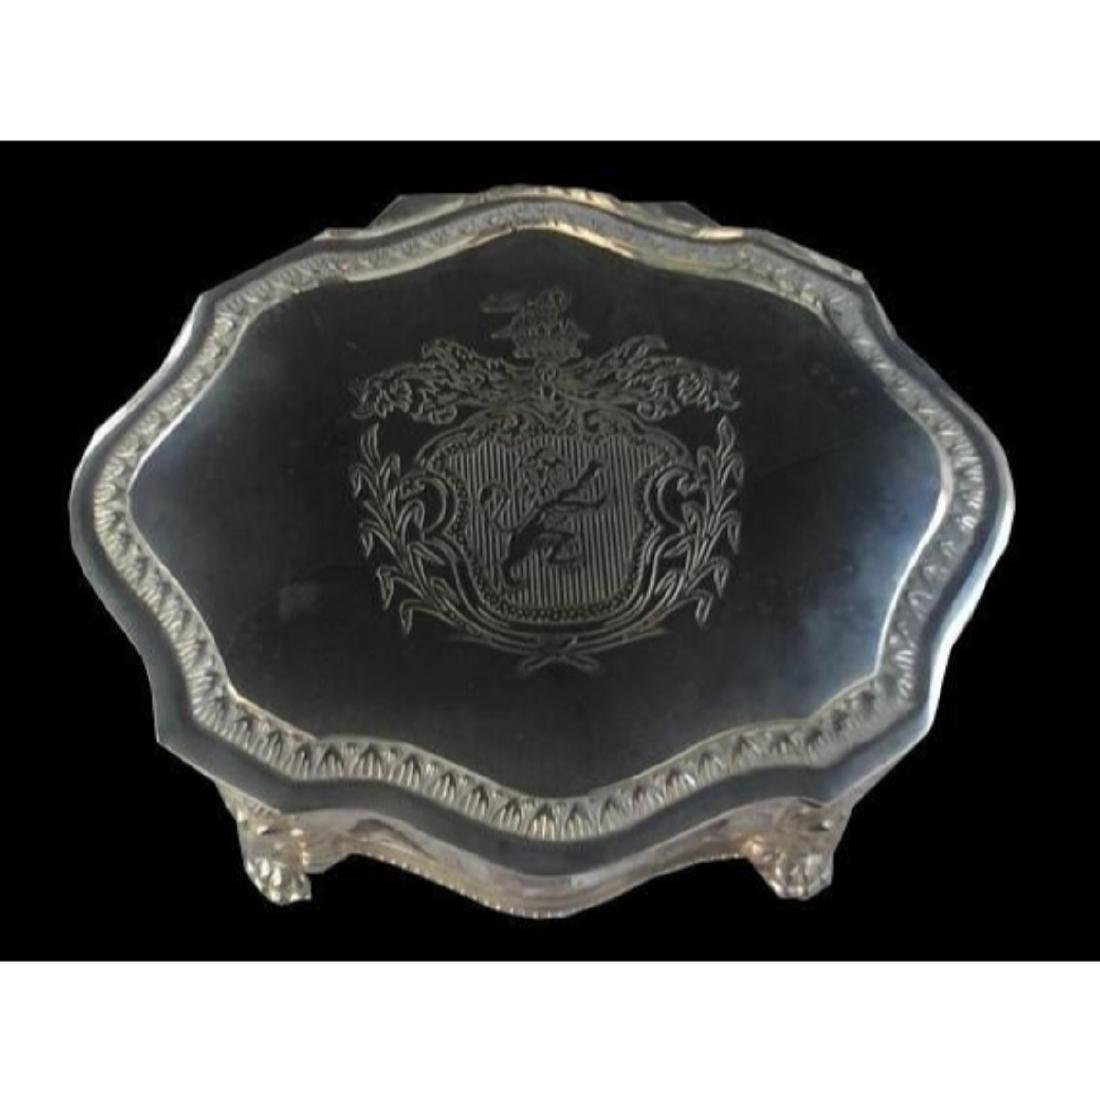 Antique Trinket/Jewelry Box